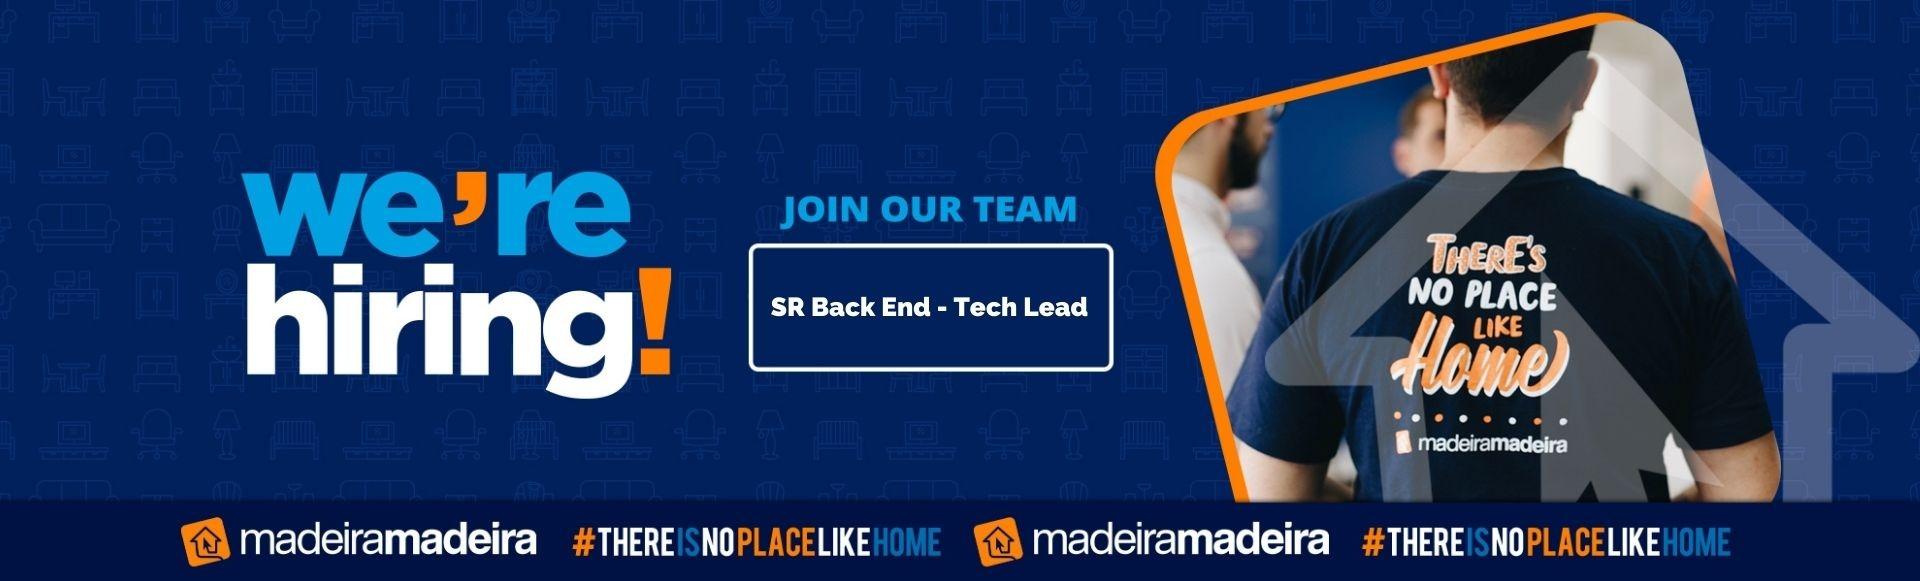 SR Back End - Tech Lead